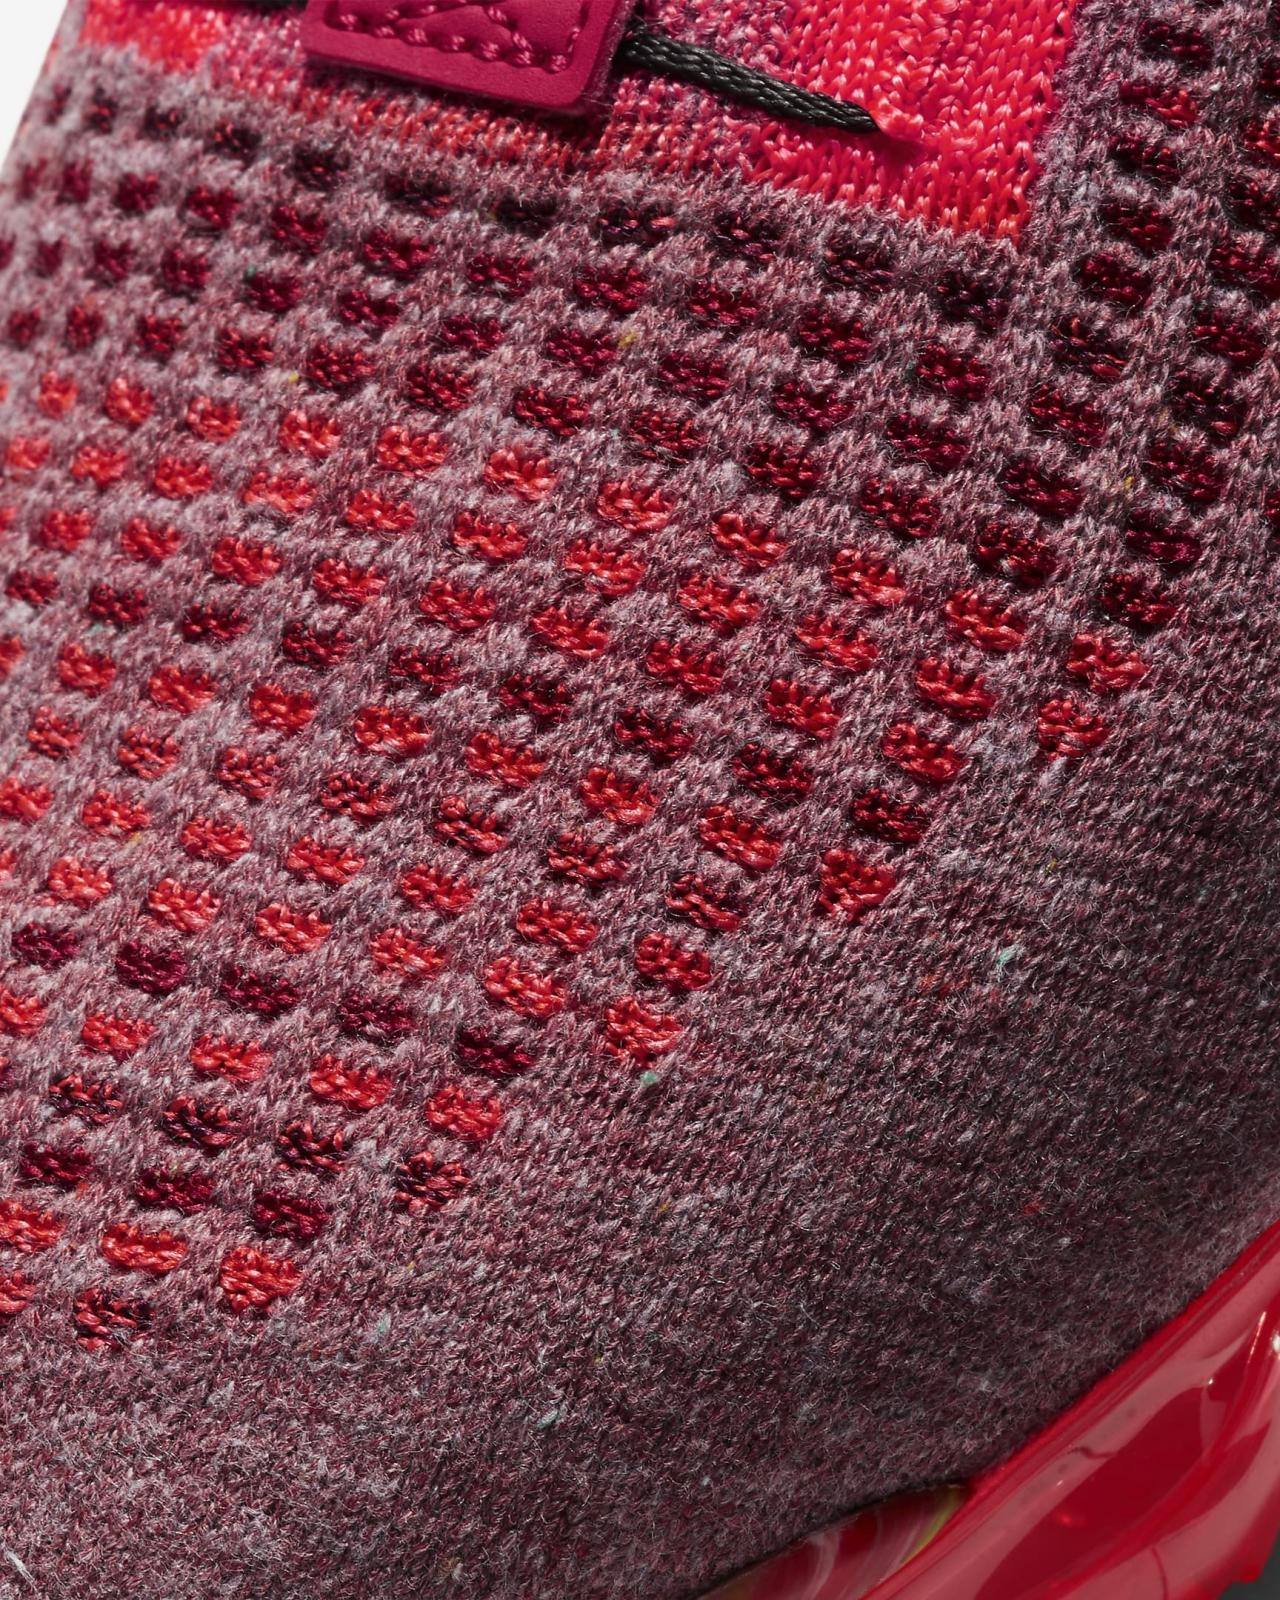 Nike Running推出队红/闪电深红/健身红色Air VaporMax 2020 FK